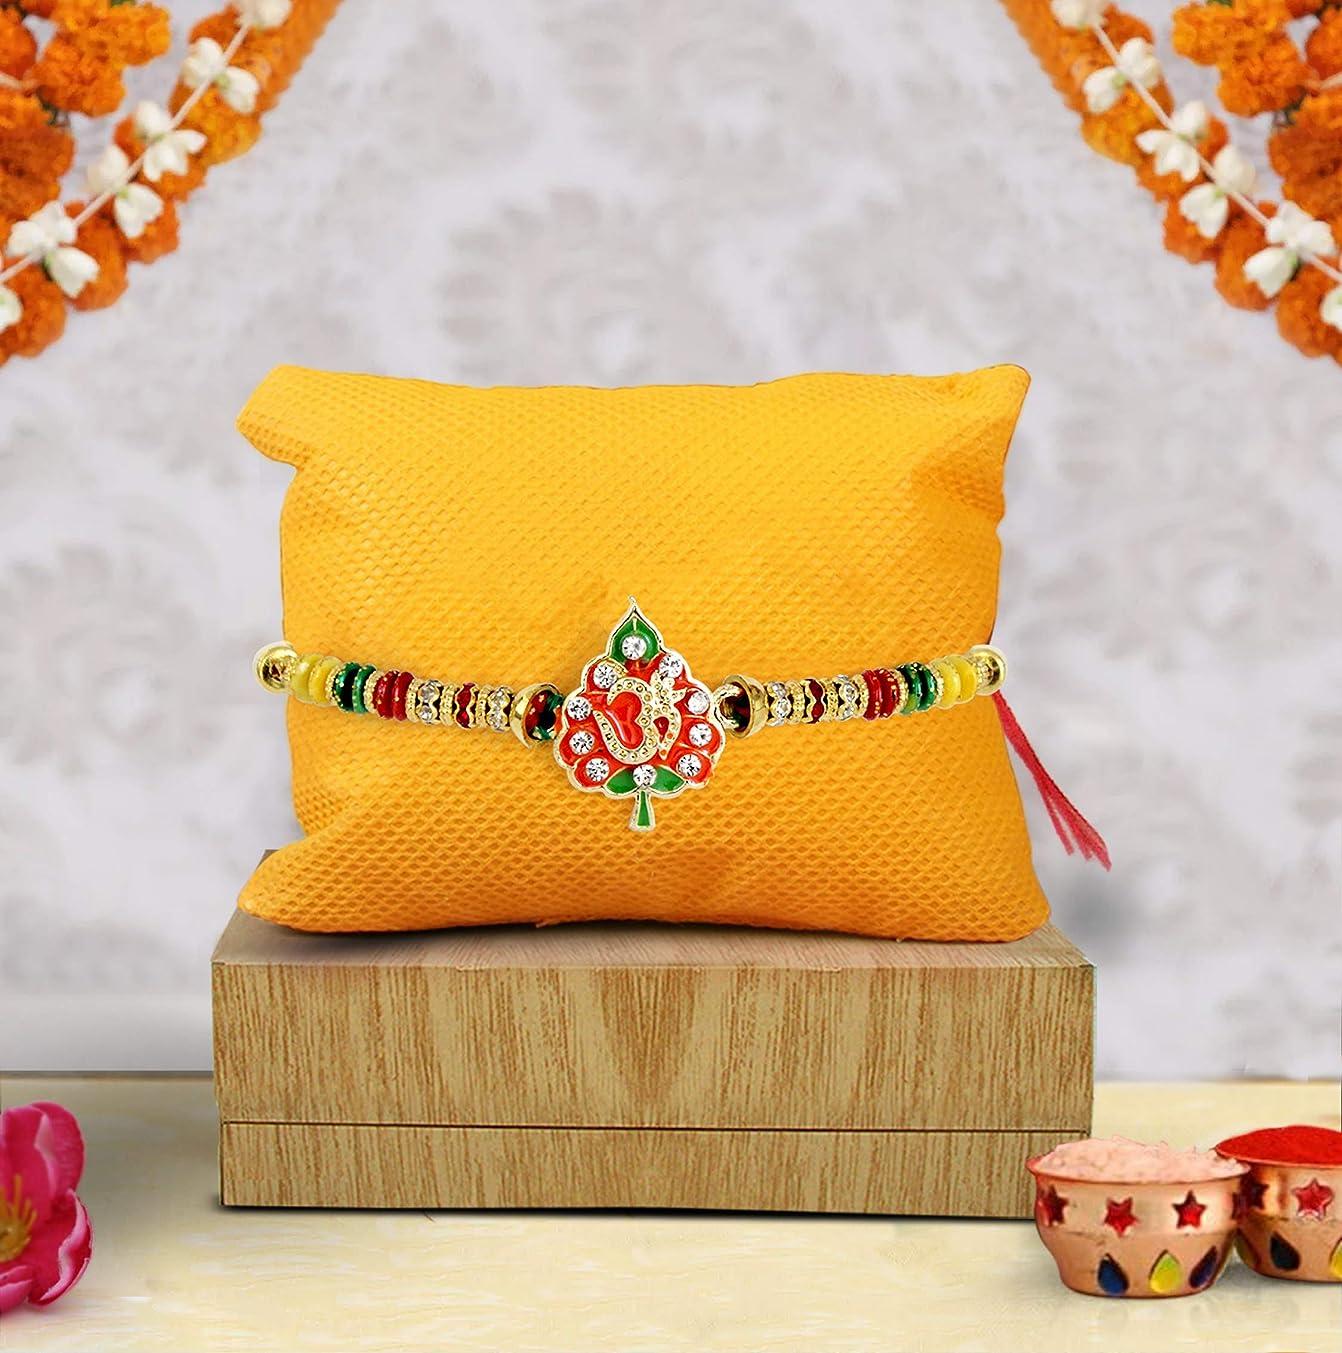 TIED RIBBONS Ethnic Rakhi Thread for Brother Designer Rakhi for Bhai on Rakshabandhan with Rakshabandhan Special Card